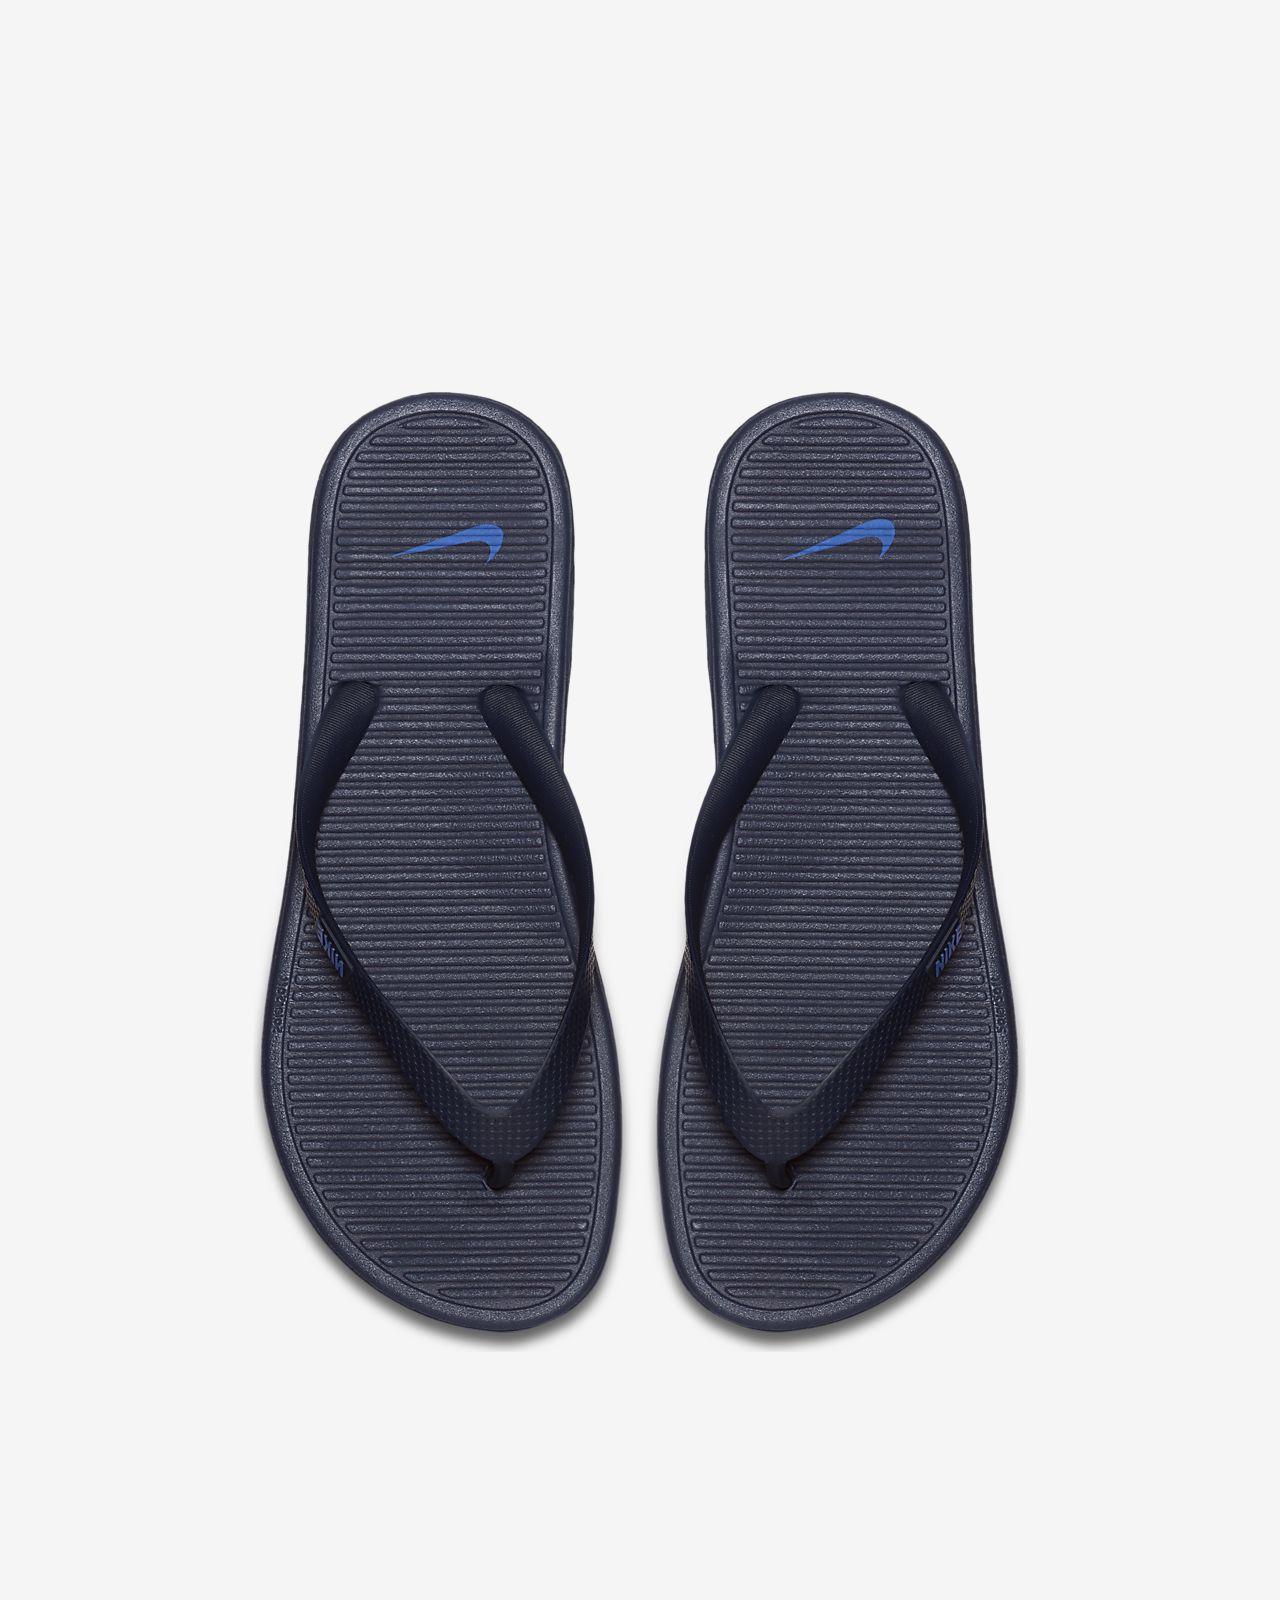 5a3bd61c7625 Nike Solarsoft II Men s Flip Flop. Nike.com GB